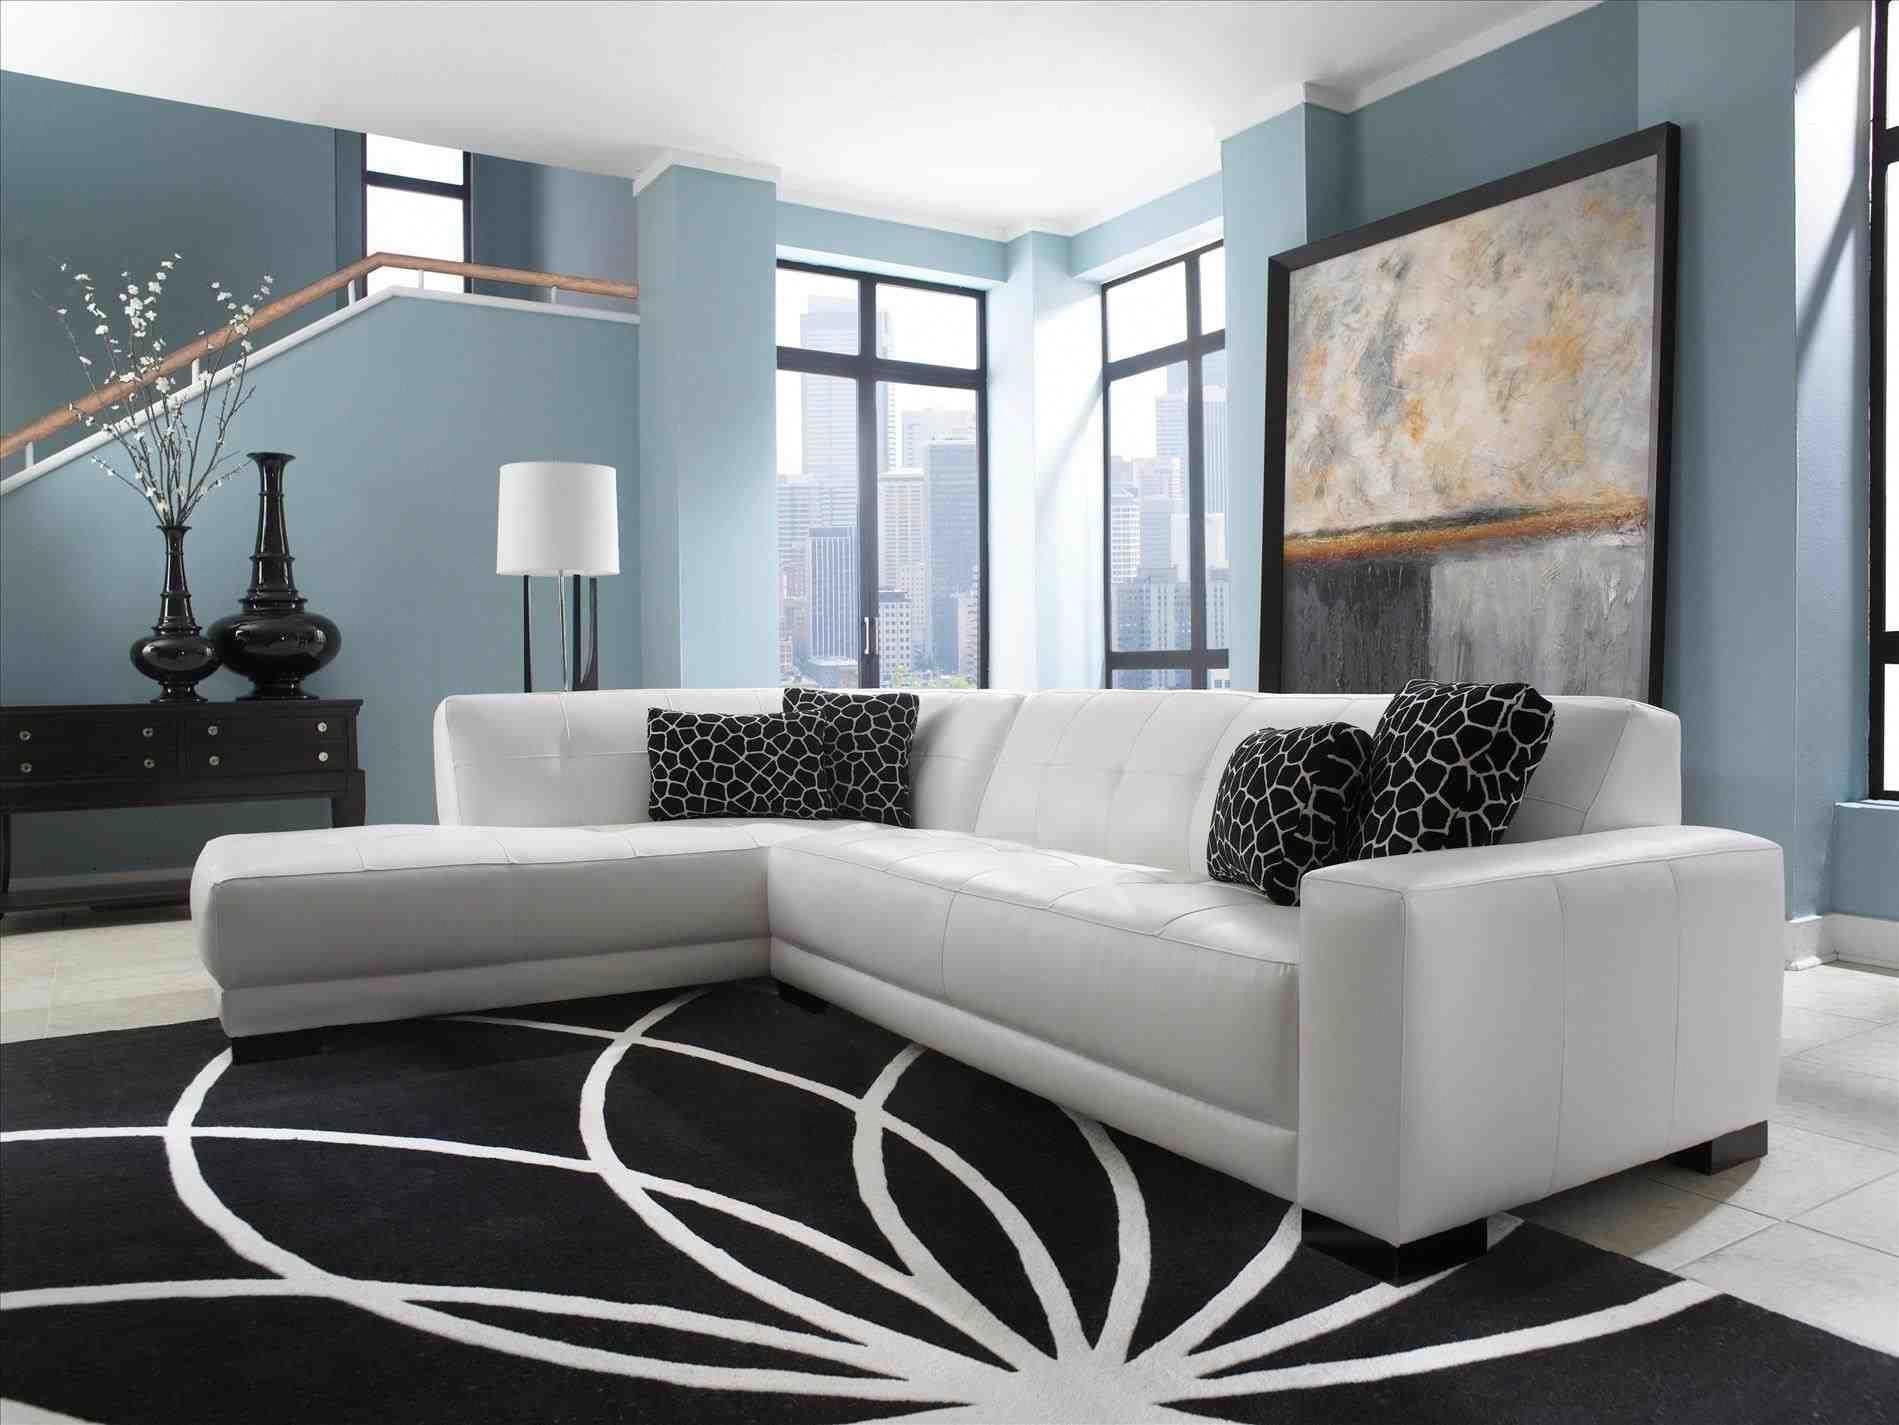 Sofa Set Design With Price In Karachi Valoblogi Com